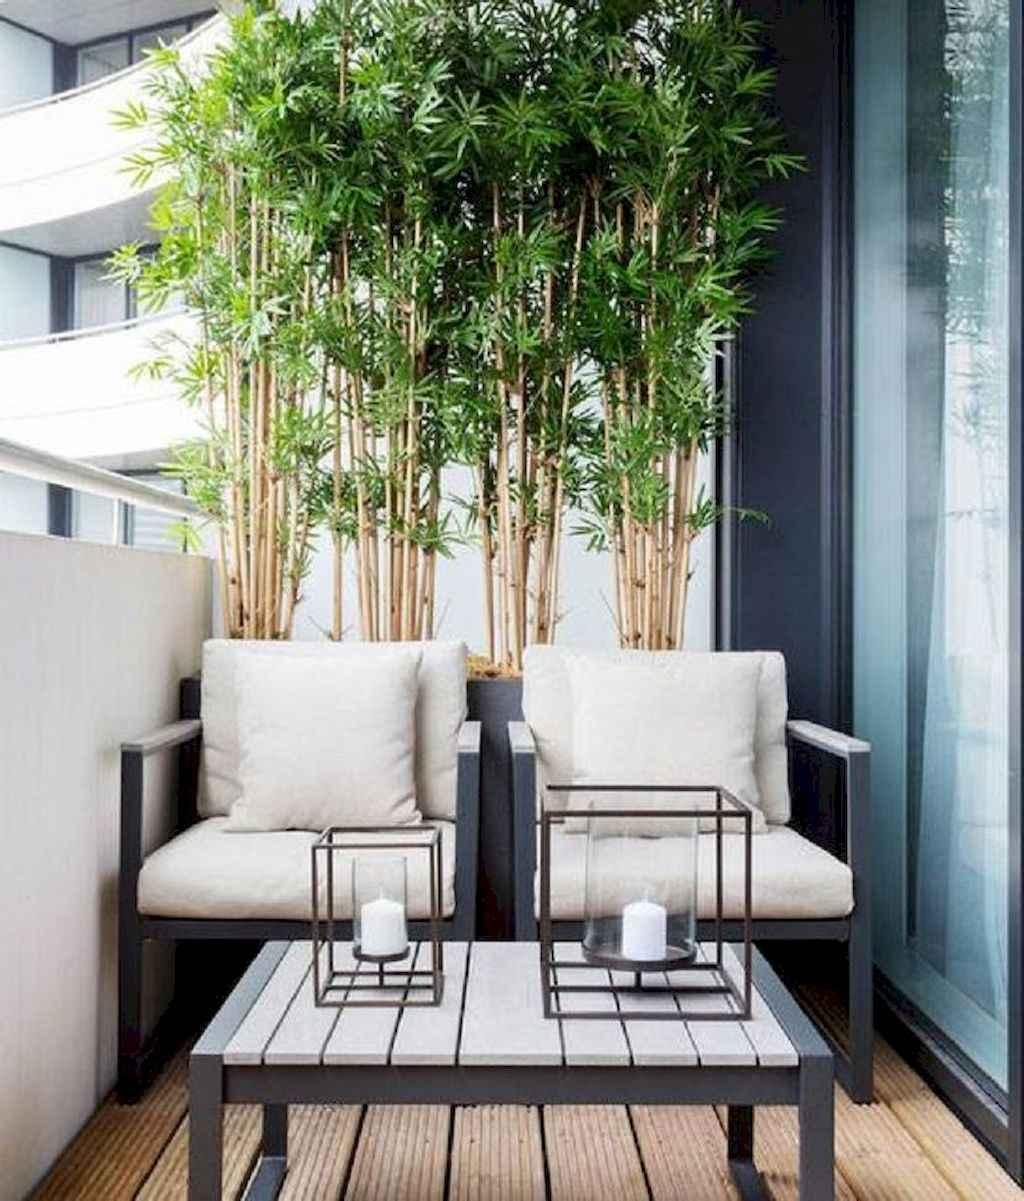 59 Cozy Apartment Balcony Decorating Ideas